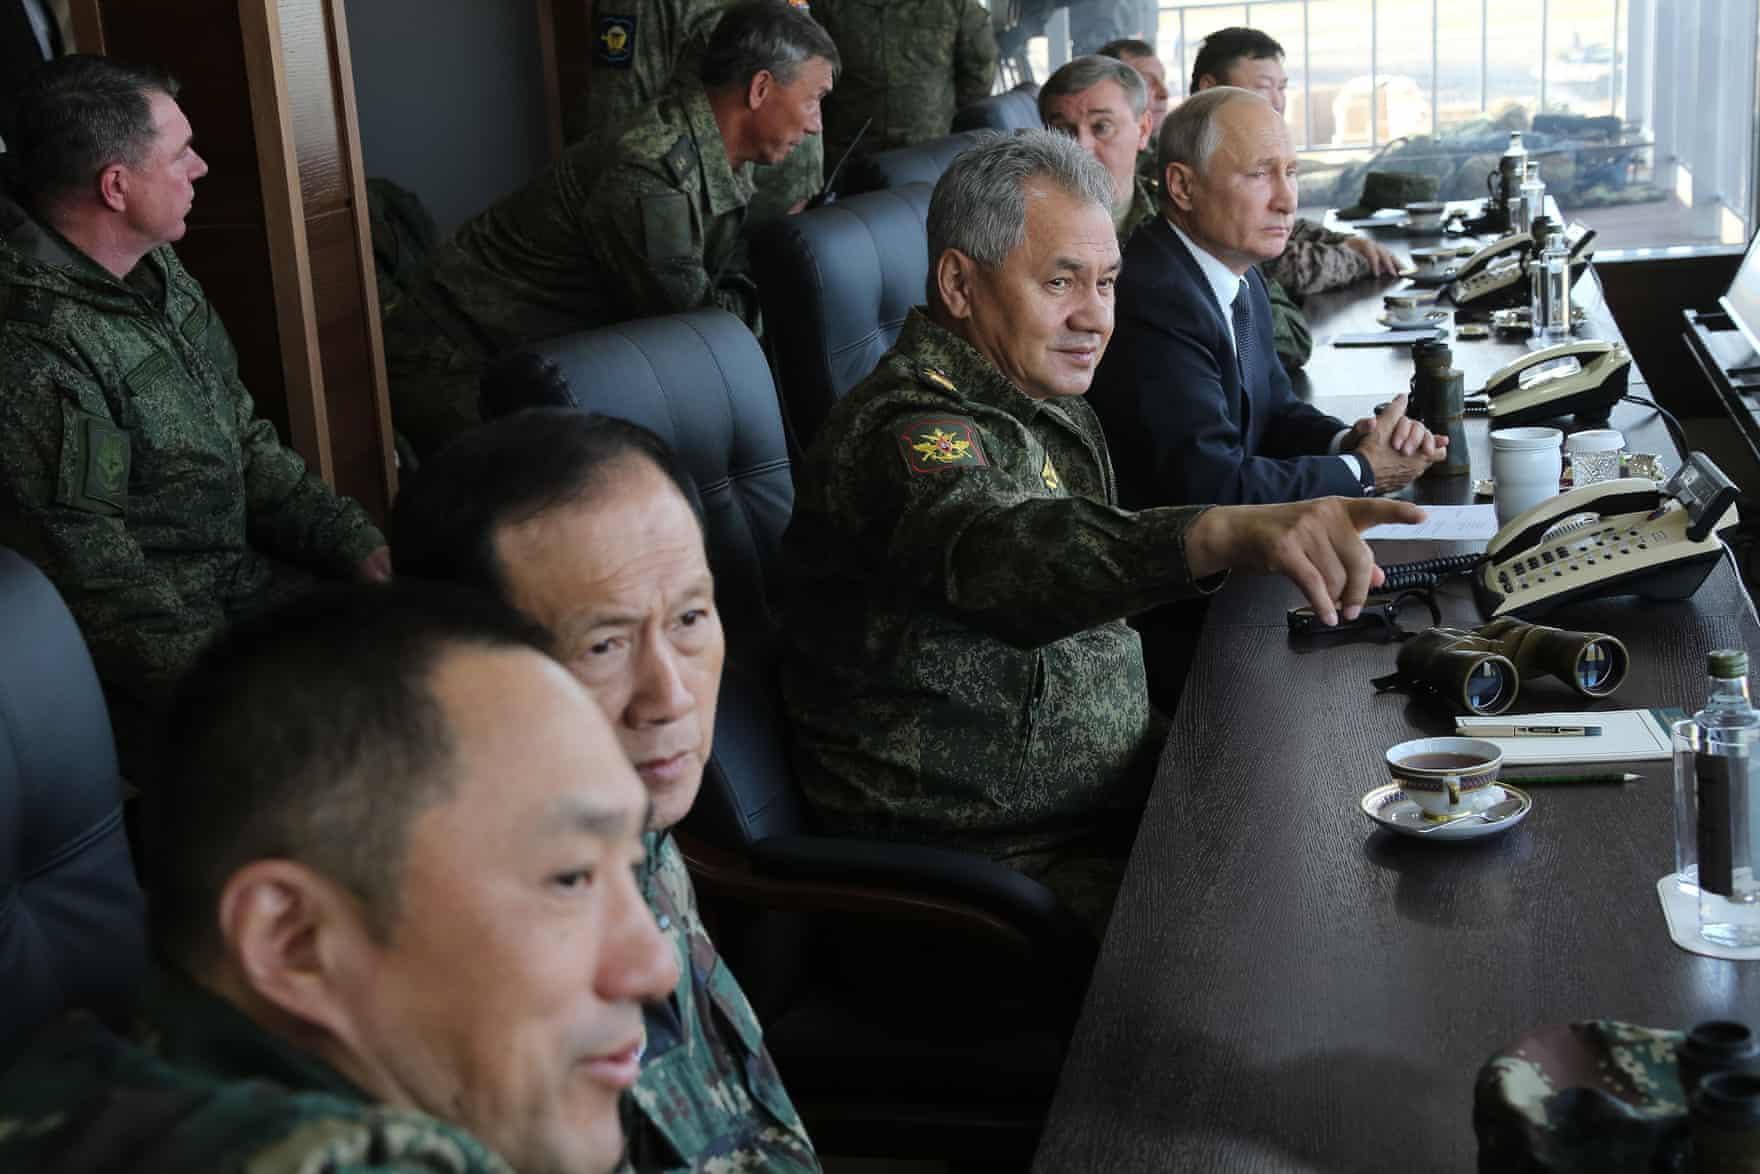 Russia's defence minister, Sergei Shoigu, and the president, Vladimir Putin, watch the Vostok war games with military personnel (Vadim Savitsky/Tass)